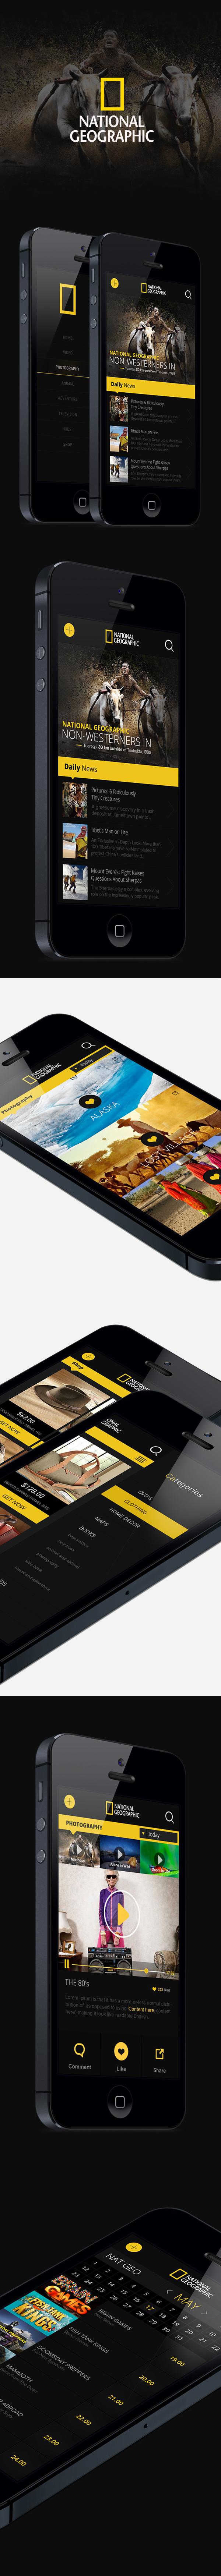 national geographic NATGEO app iphone